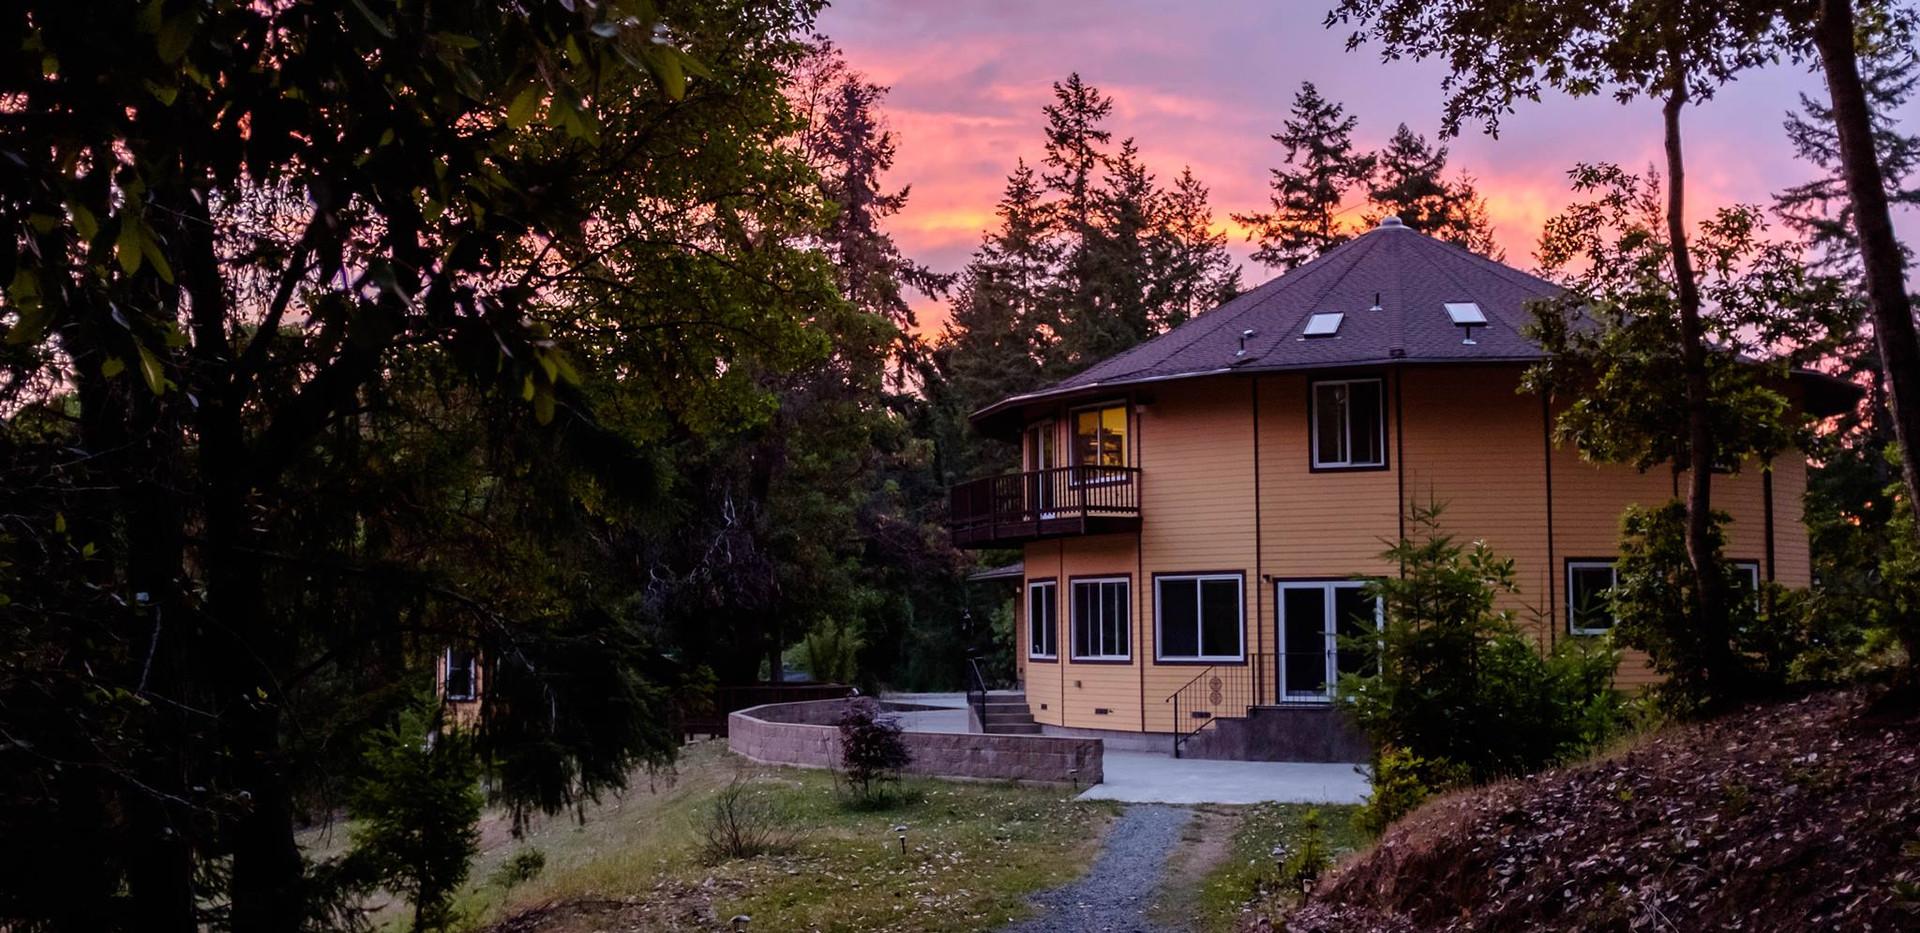 rc_sunset.jpg